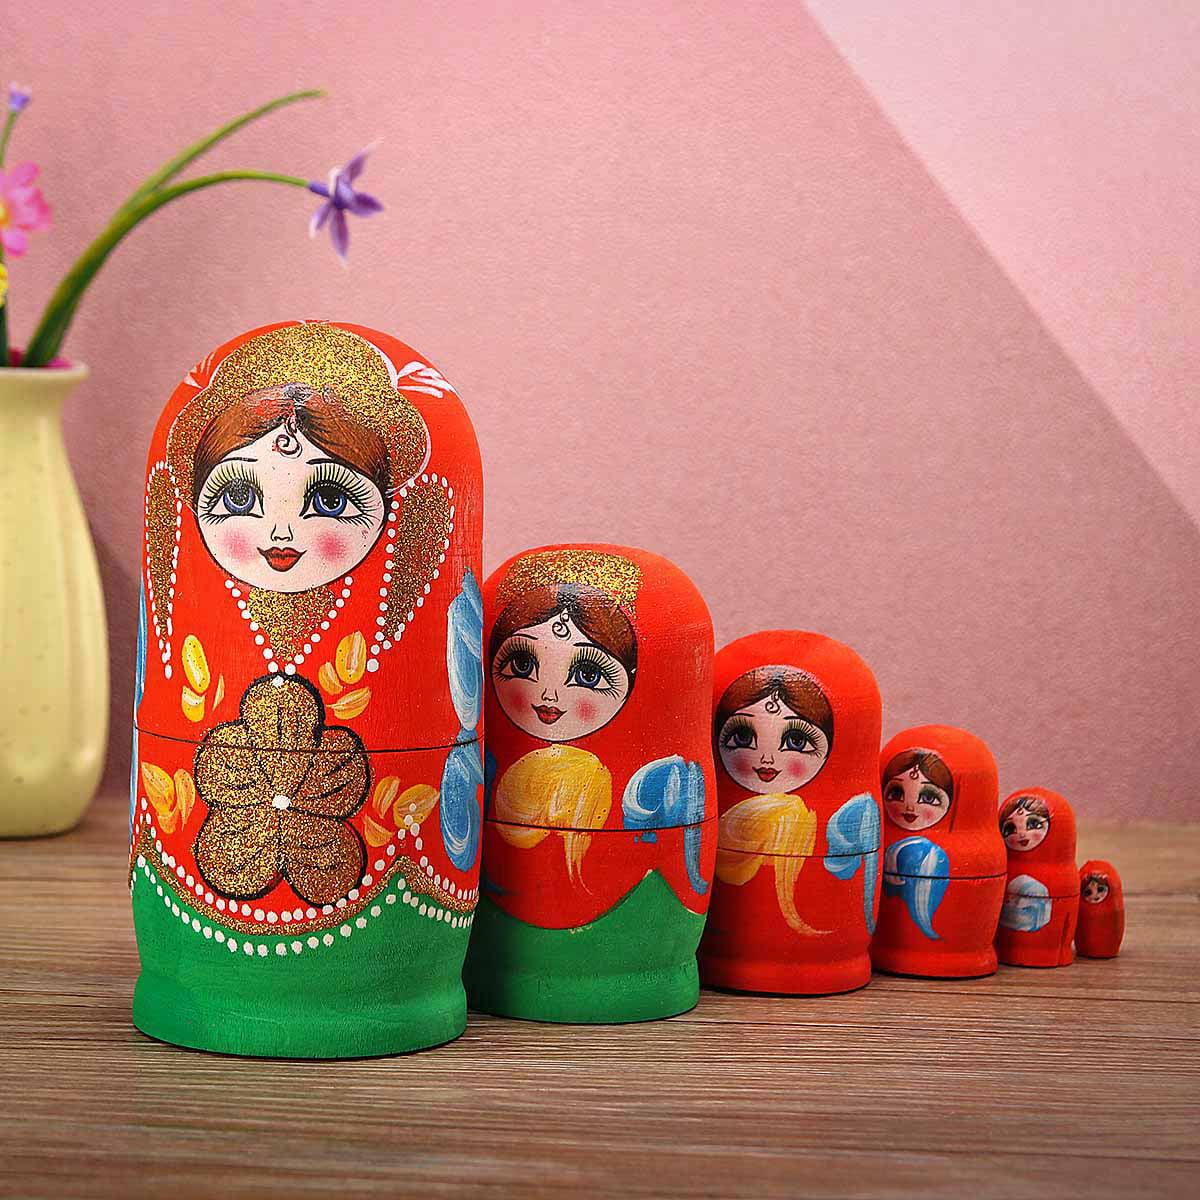 8/'/' 10PCS Wooden Russian Nesting Doll Matryoshka Babushka Hand Painted Toy Gift